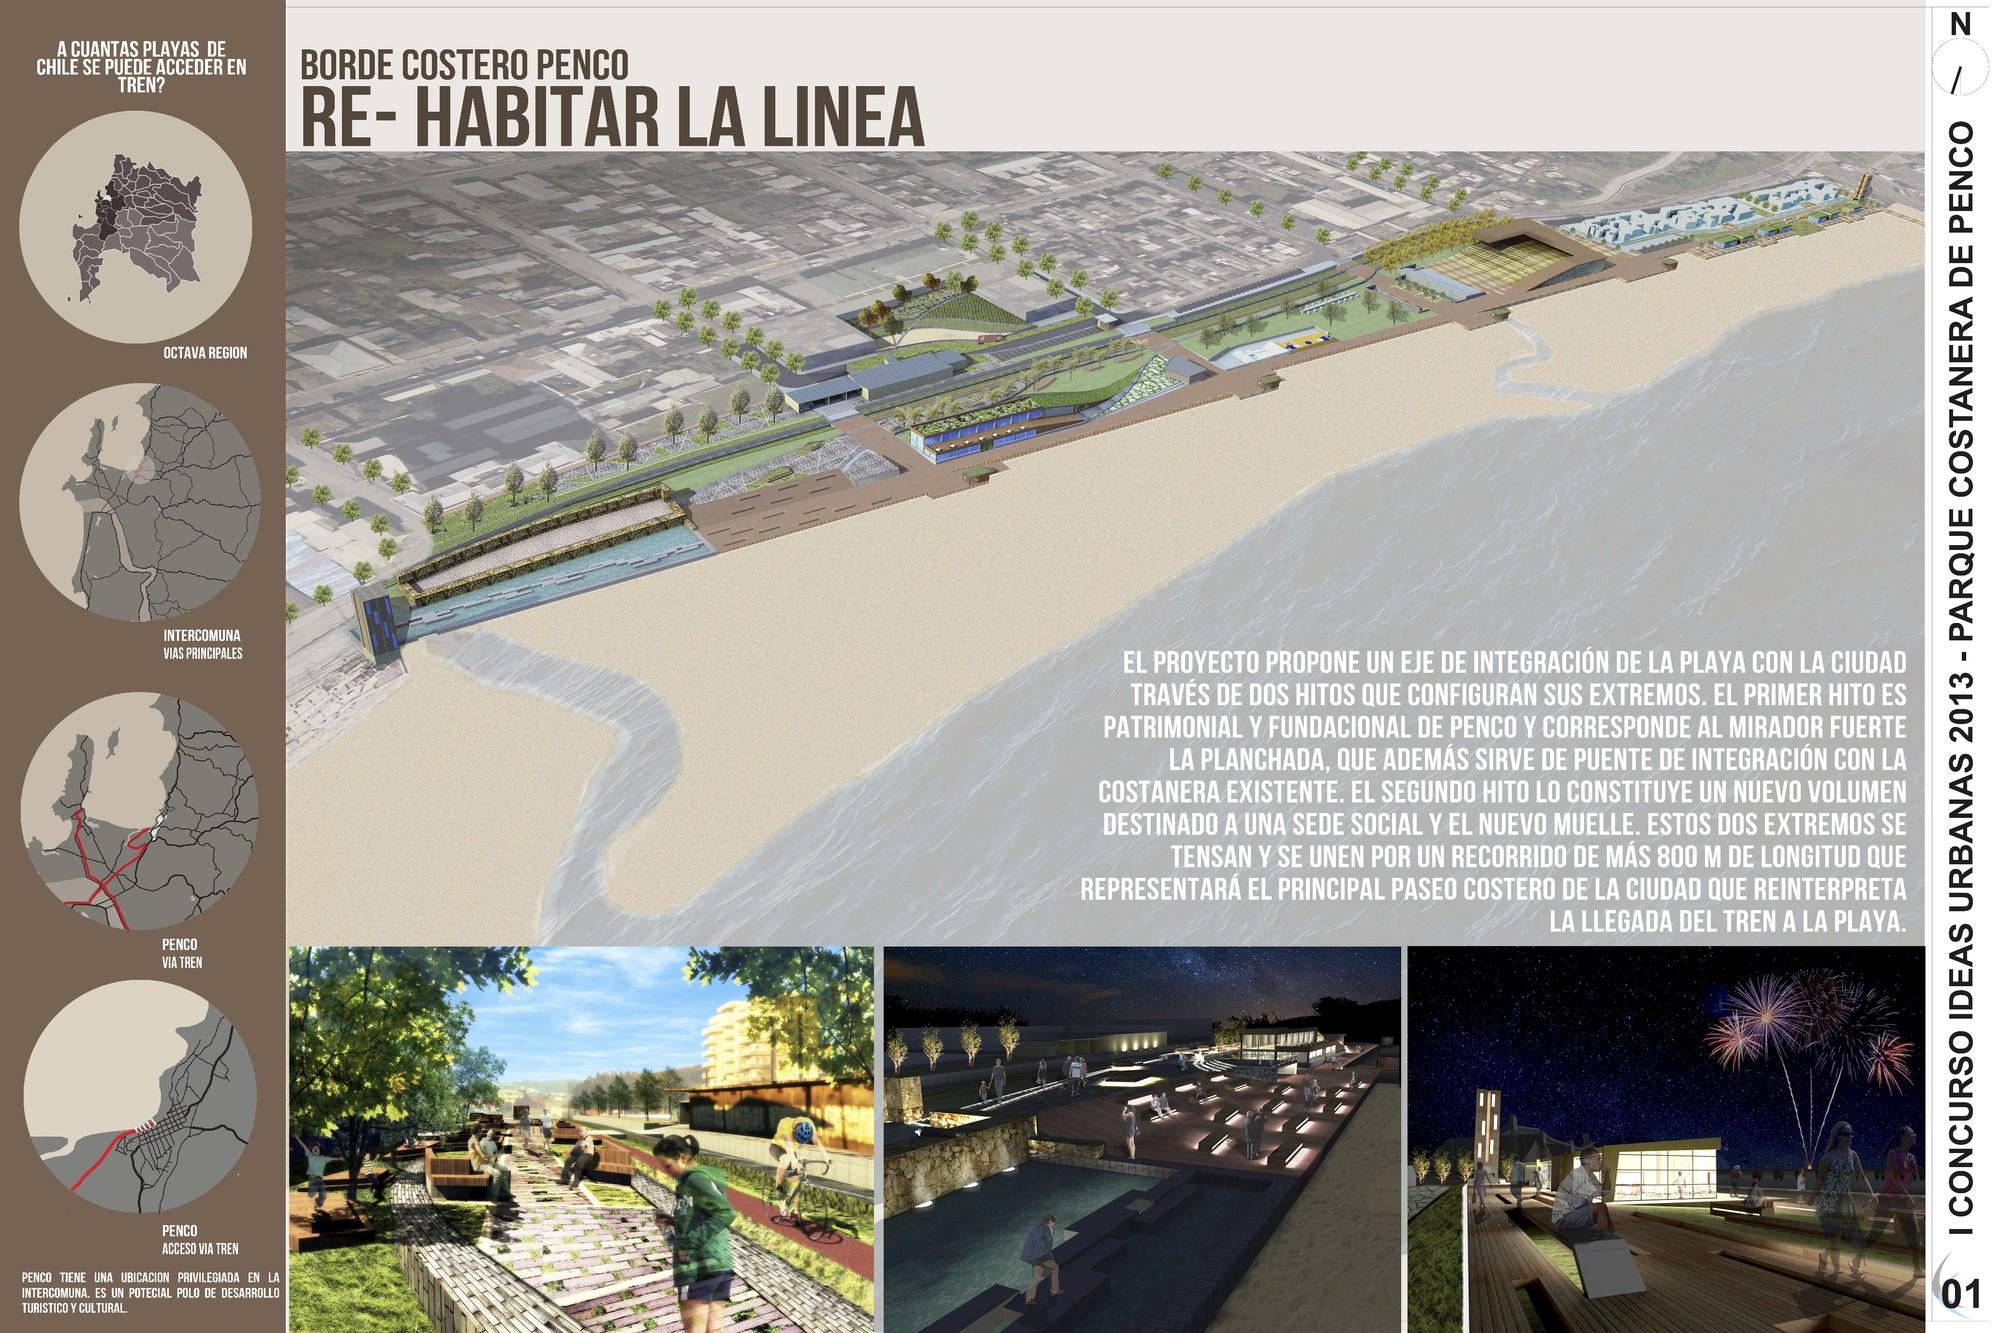 Tercer Lugar. Image Courtesy of Coordinadora Nacional de Estudiantes de Arquitectura